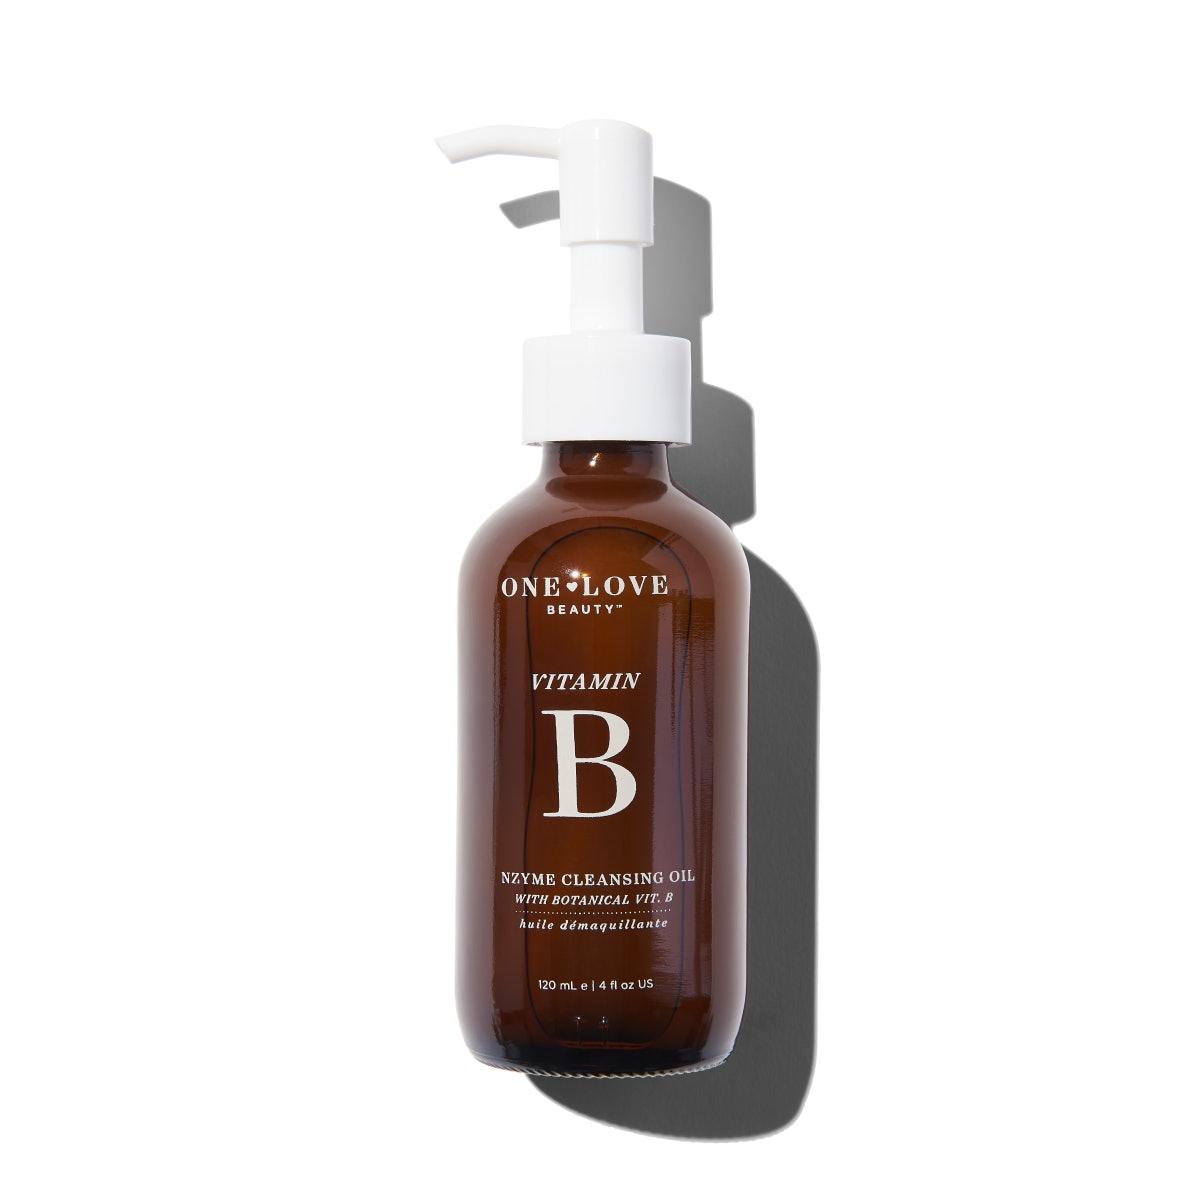 Vitamin B Cleansing Oil